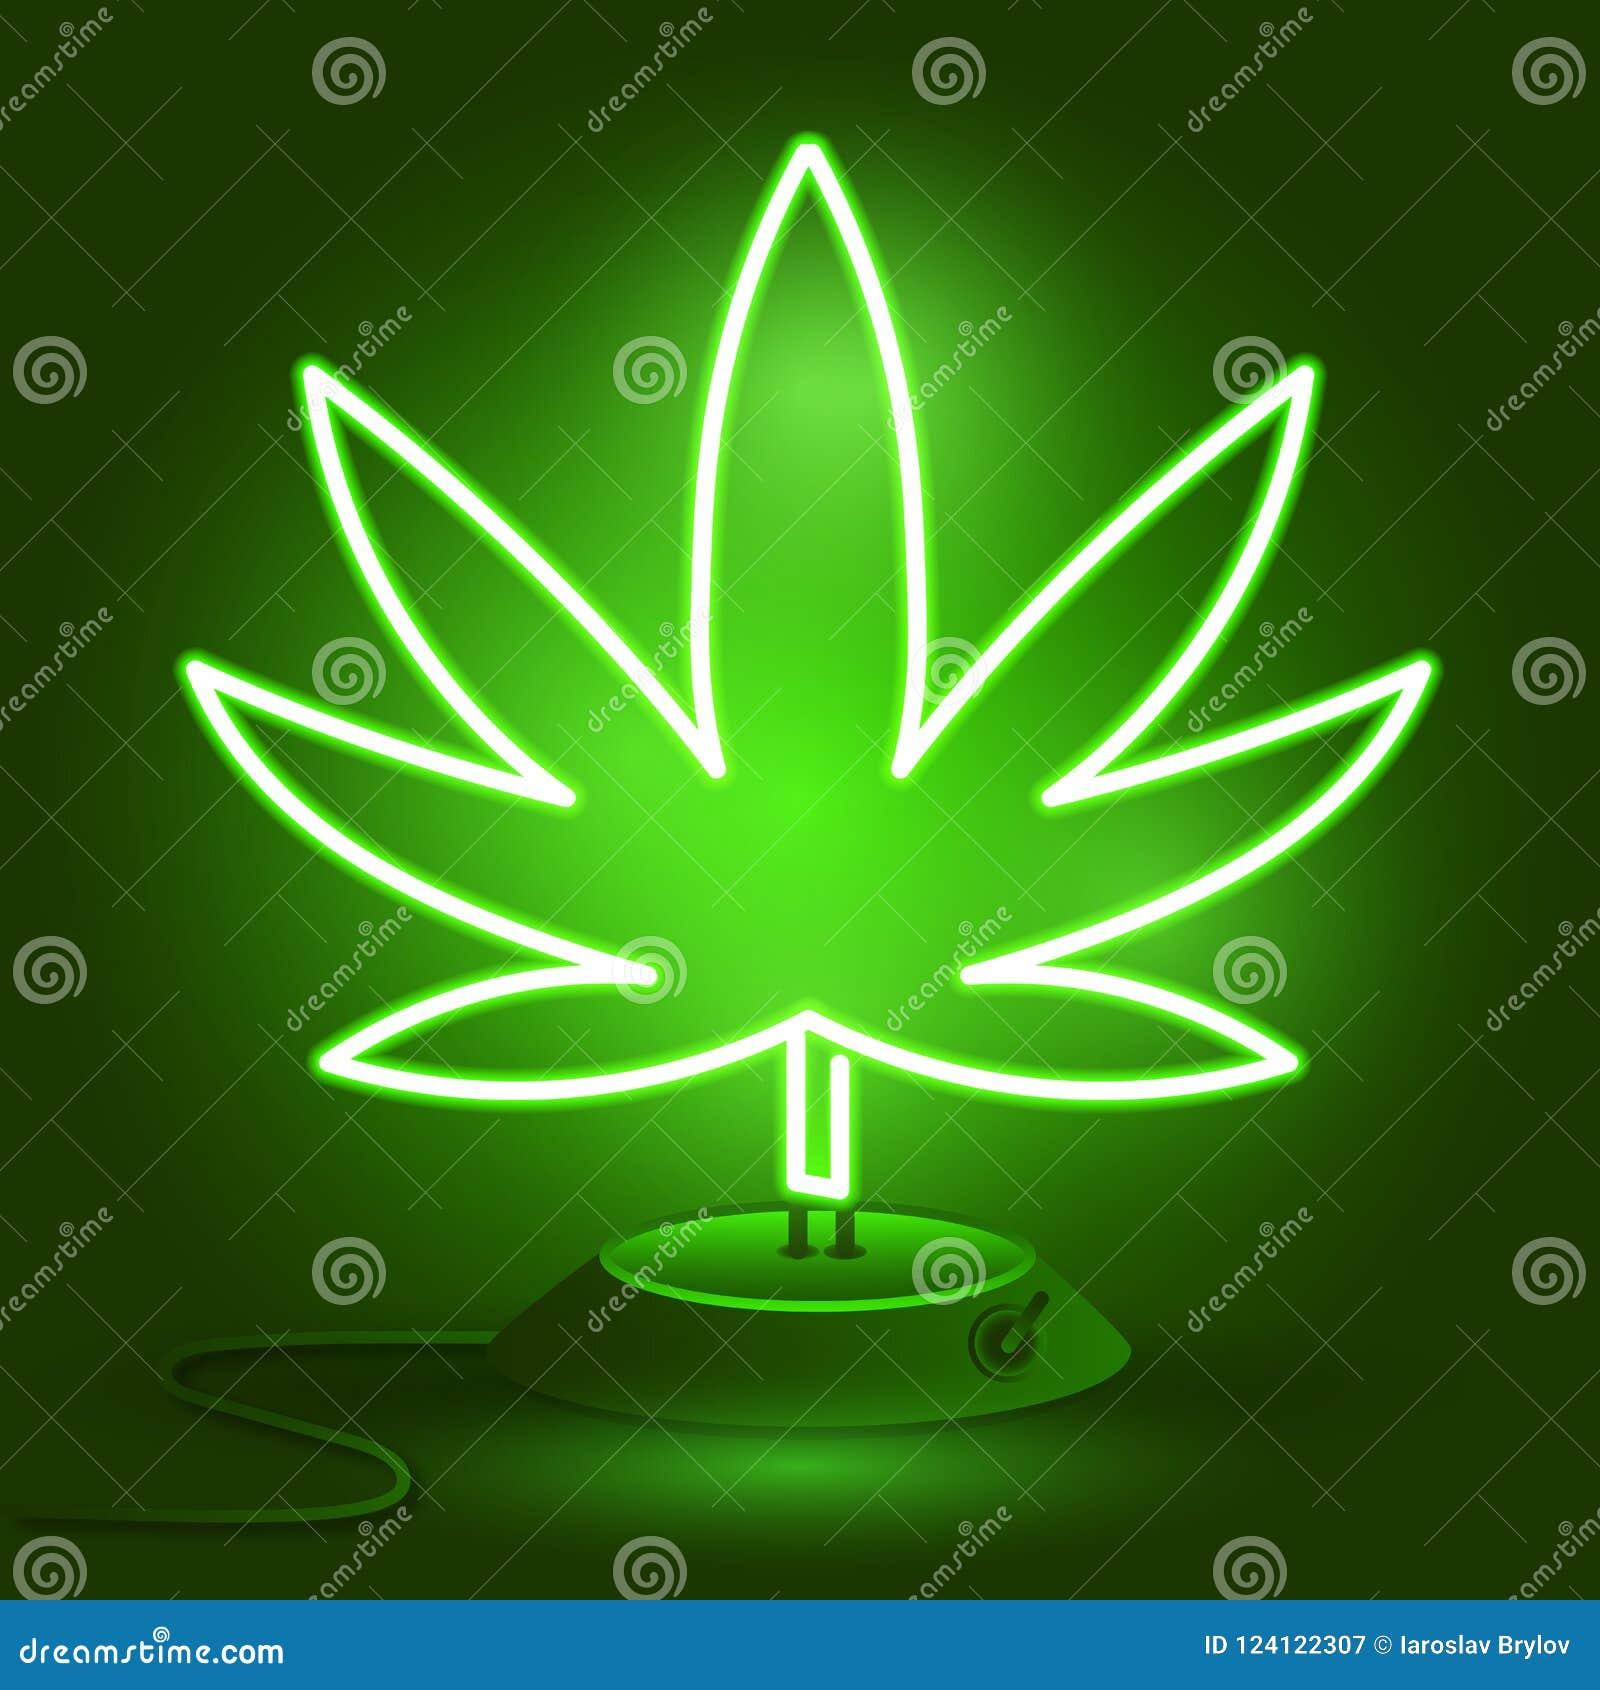 Medical Cannabis Logo With Marijuana Leaf Glowing Neon Light Style